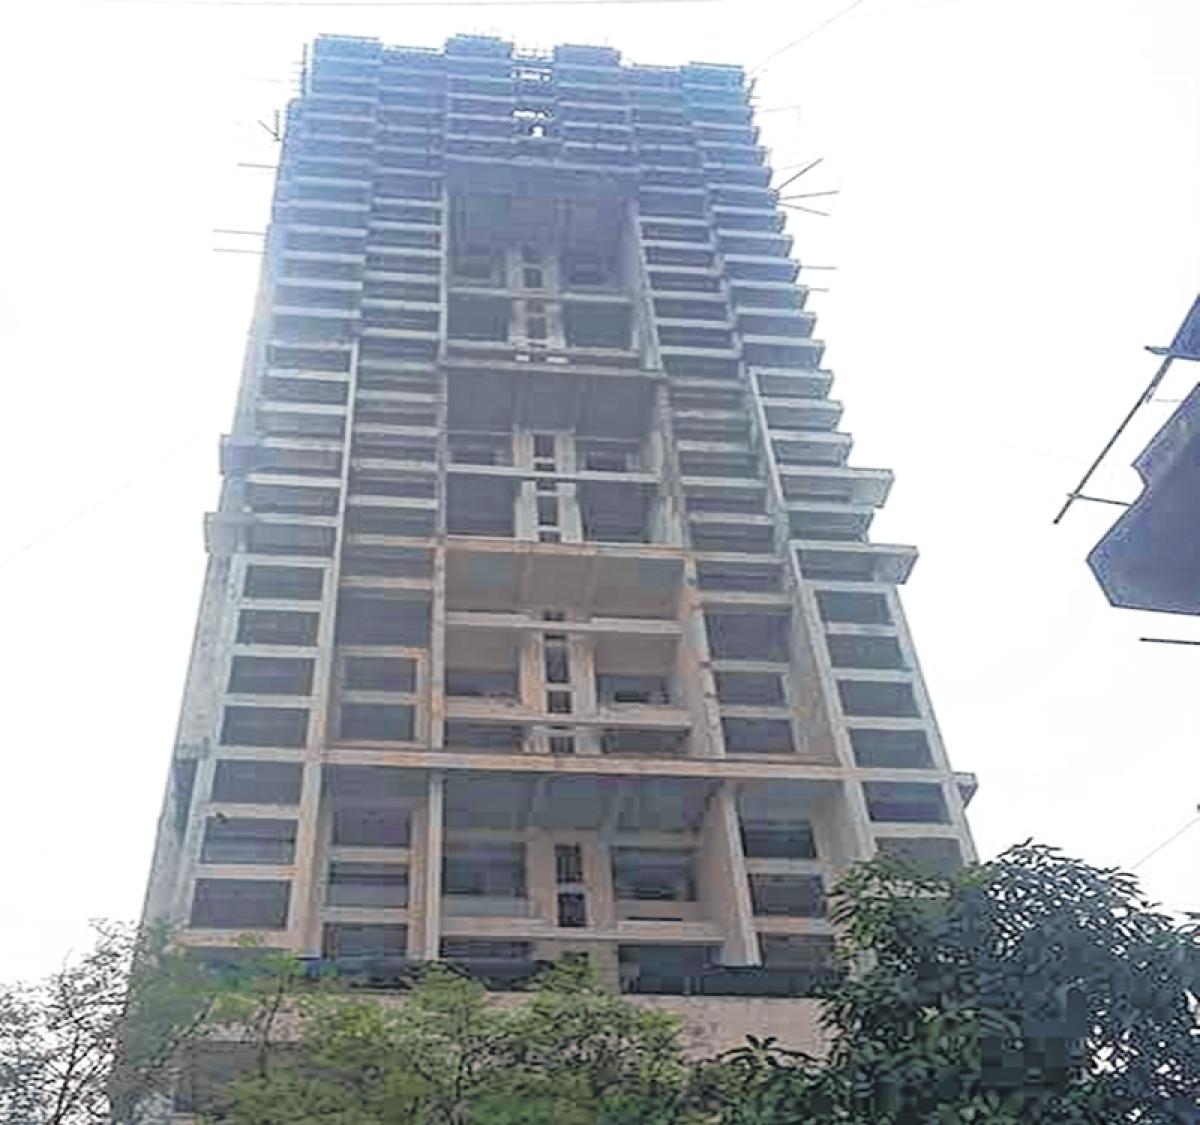 MHADA sets May 31 deadline for Esplanade Mansion tenants